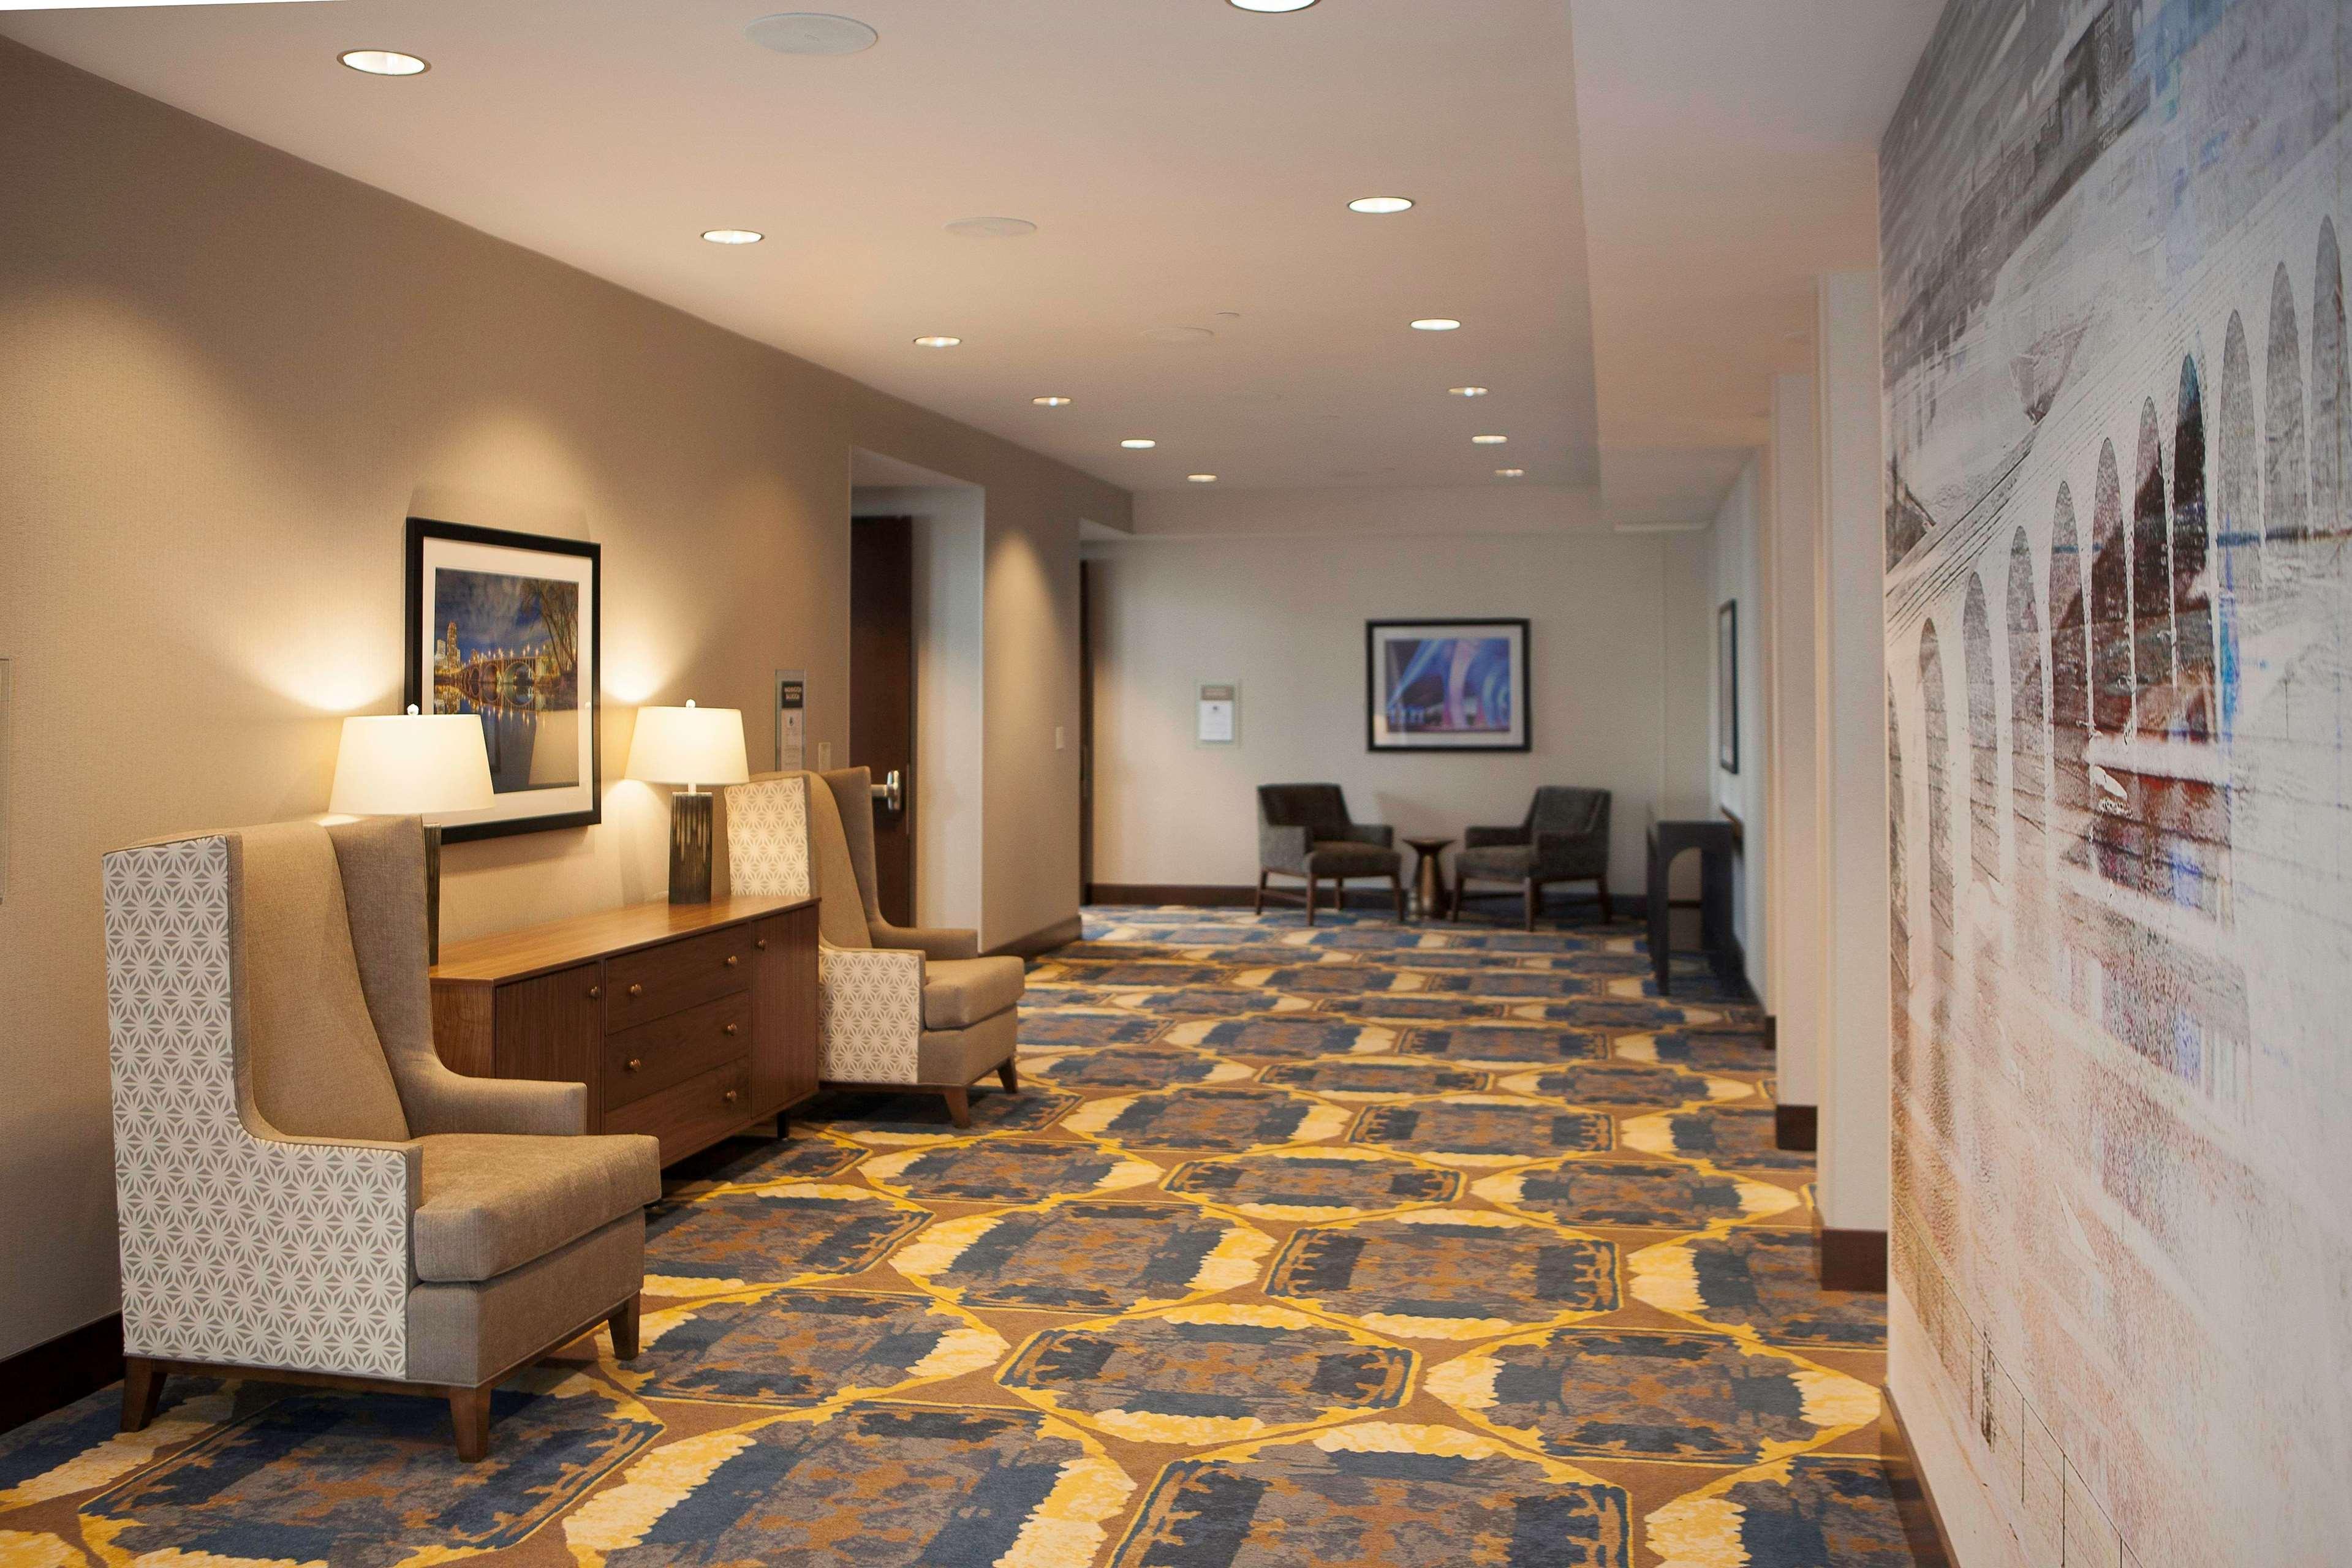 DoubleTree by Hilton Hotel Minneapolis - University Area image 2